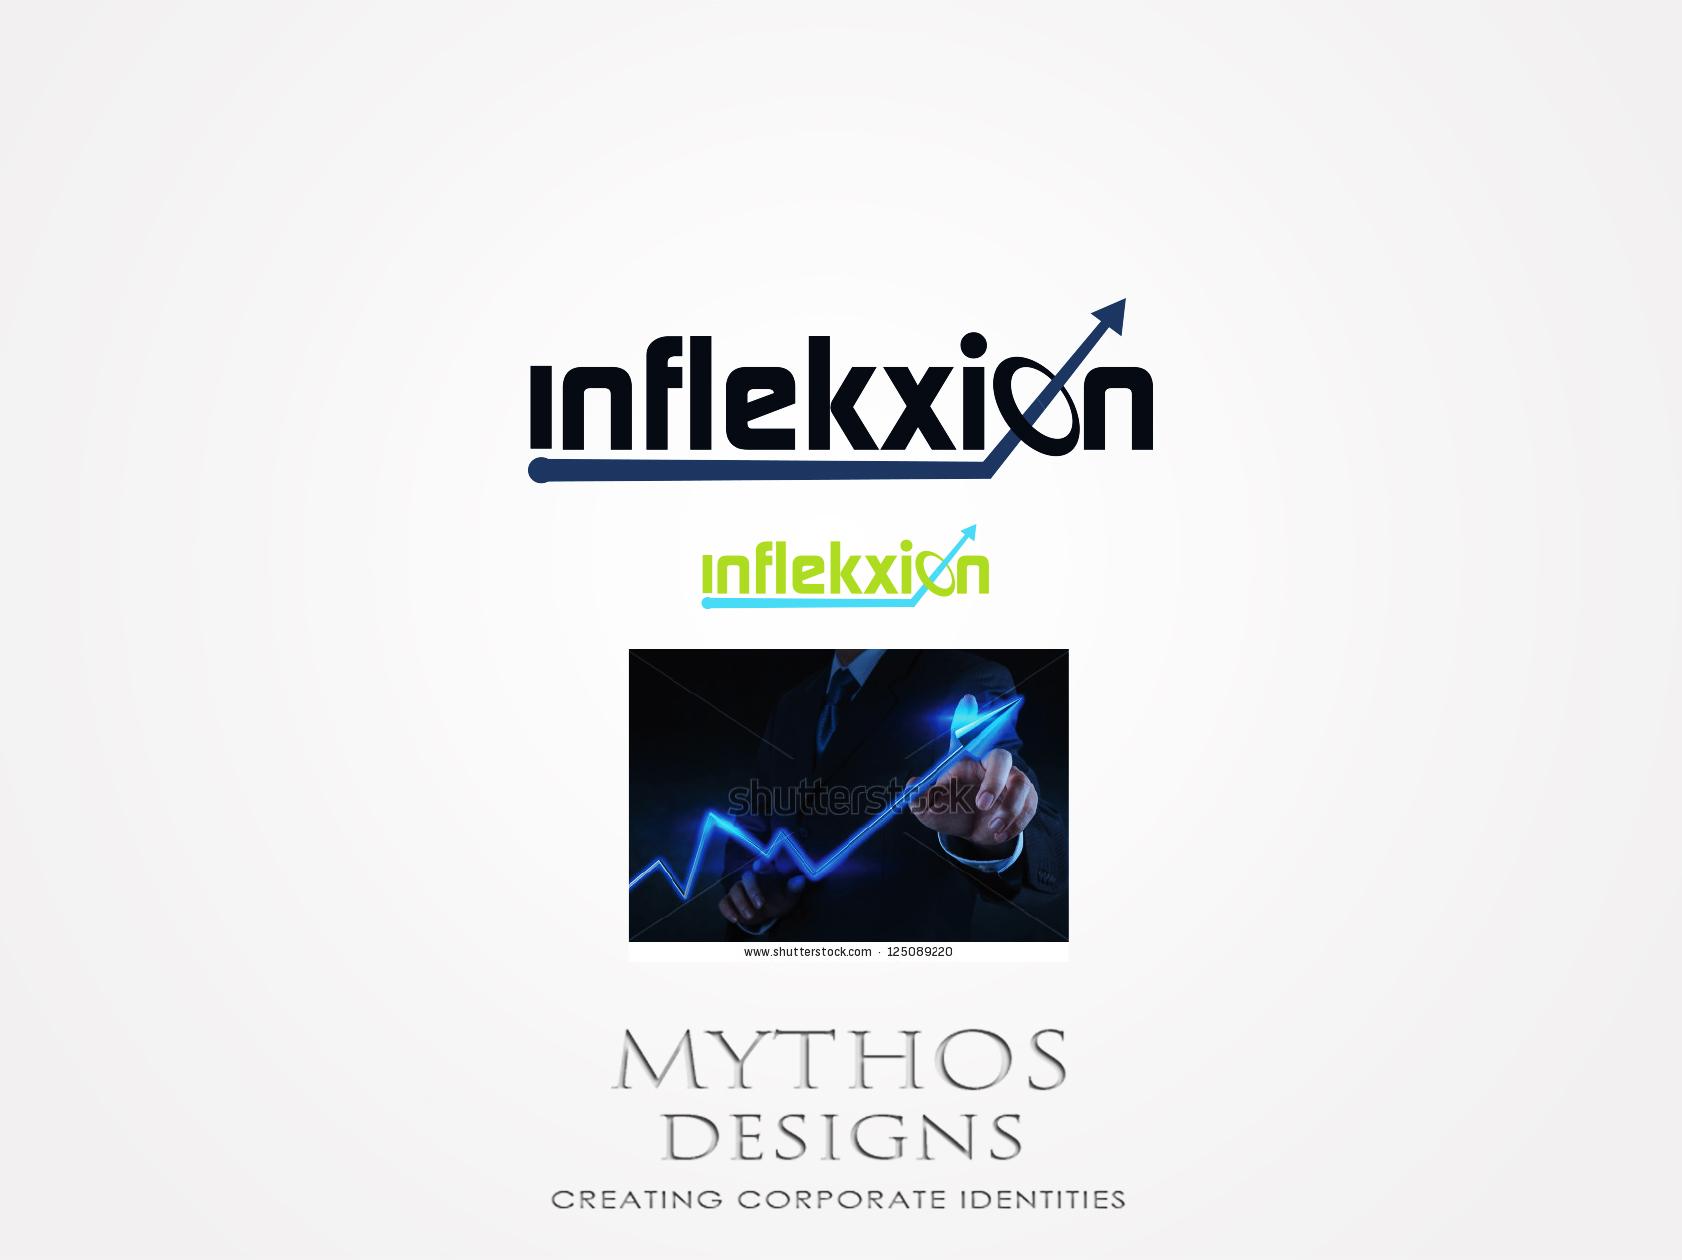 Logo Design by Mythos Designs - Entry No. 196 in the Logo Design Contest Professional Logo Design for Inflekxion.